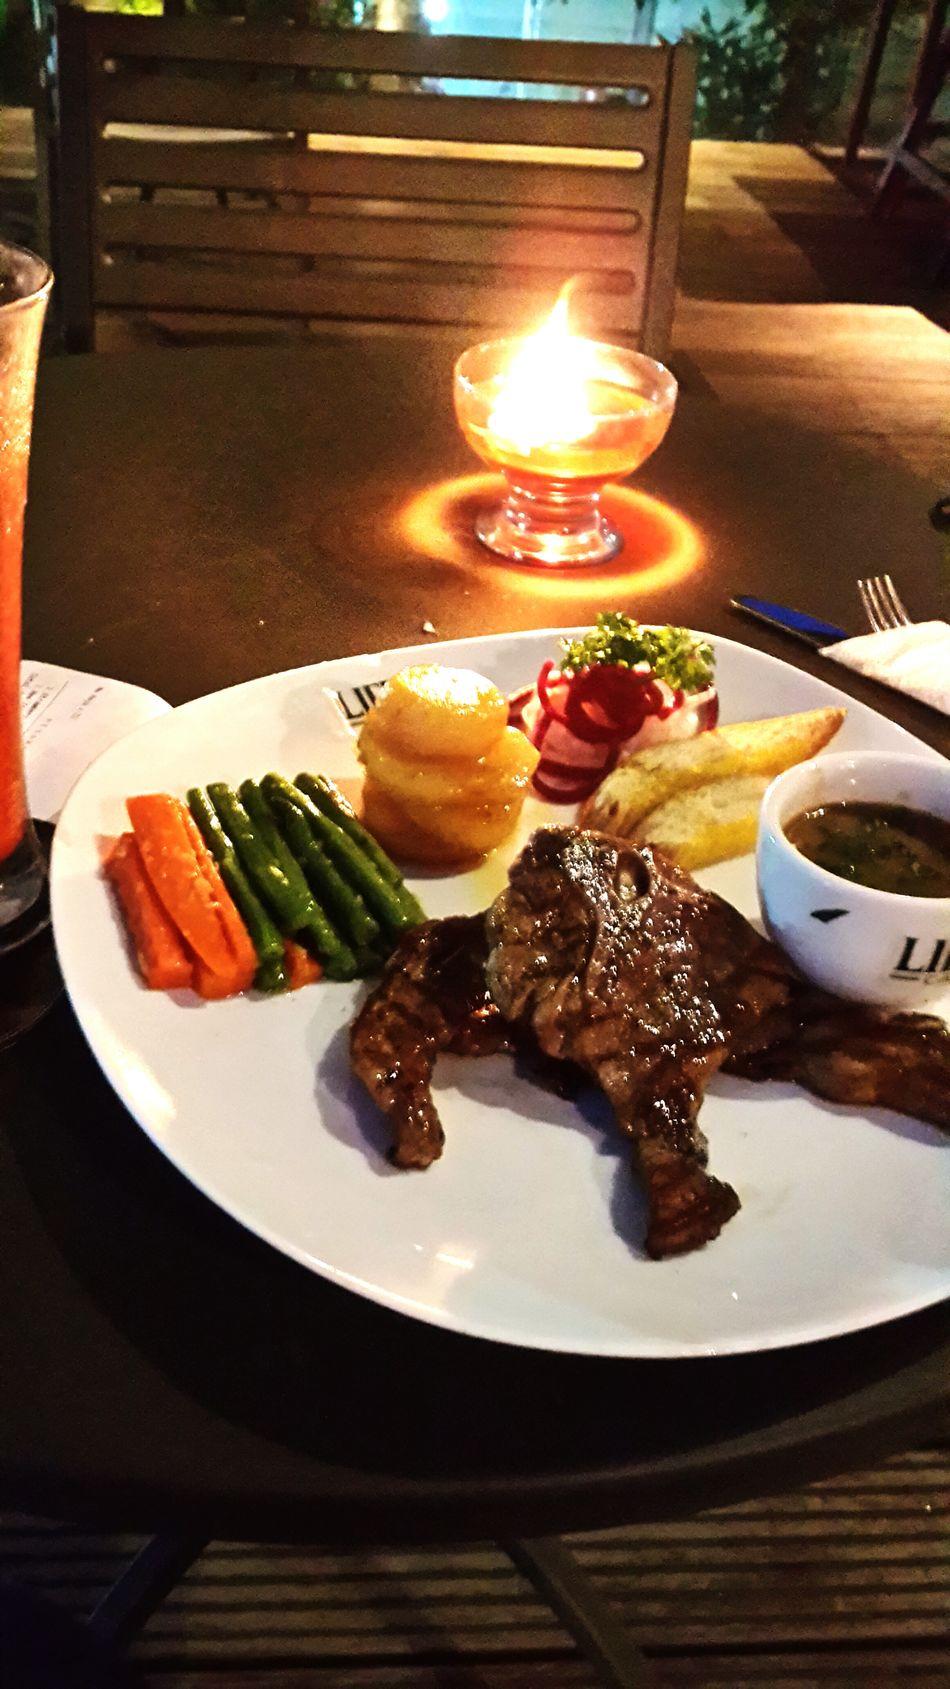 Grilled Lamb Chop Food Yummy EyeEm Enjoying Life Liep's Cafe Android Photos EyeEm Best Shots